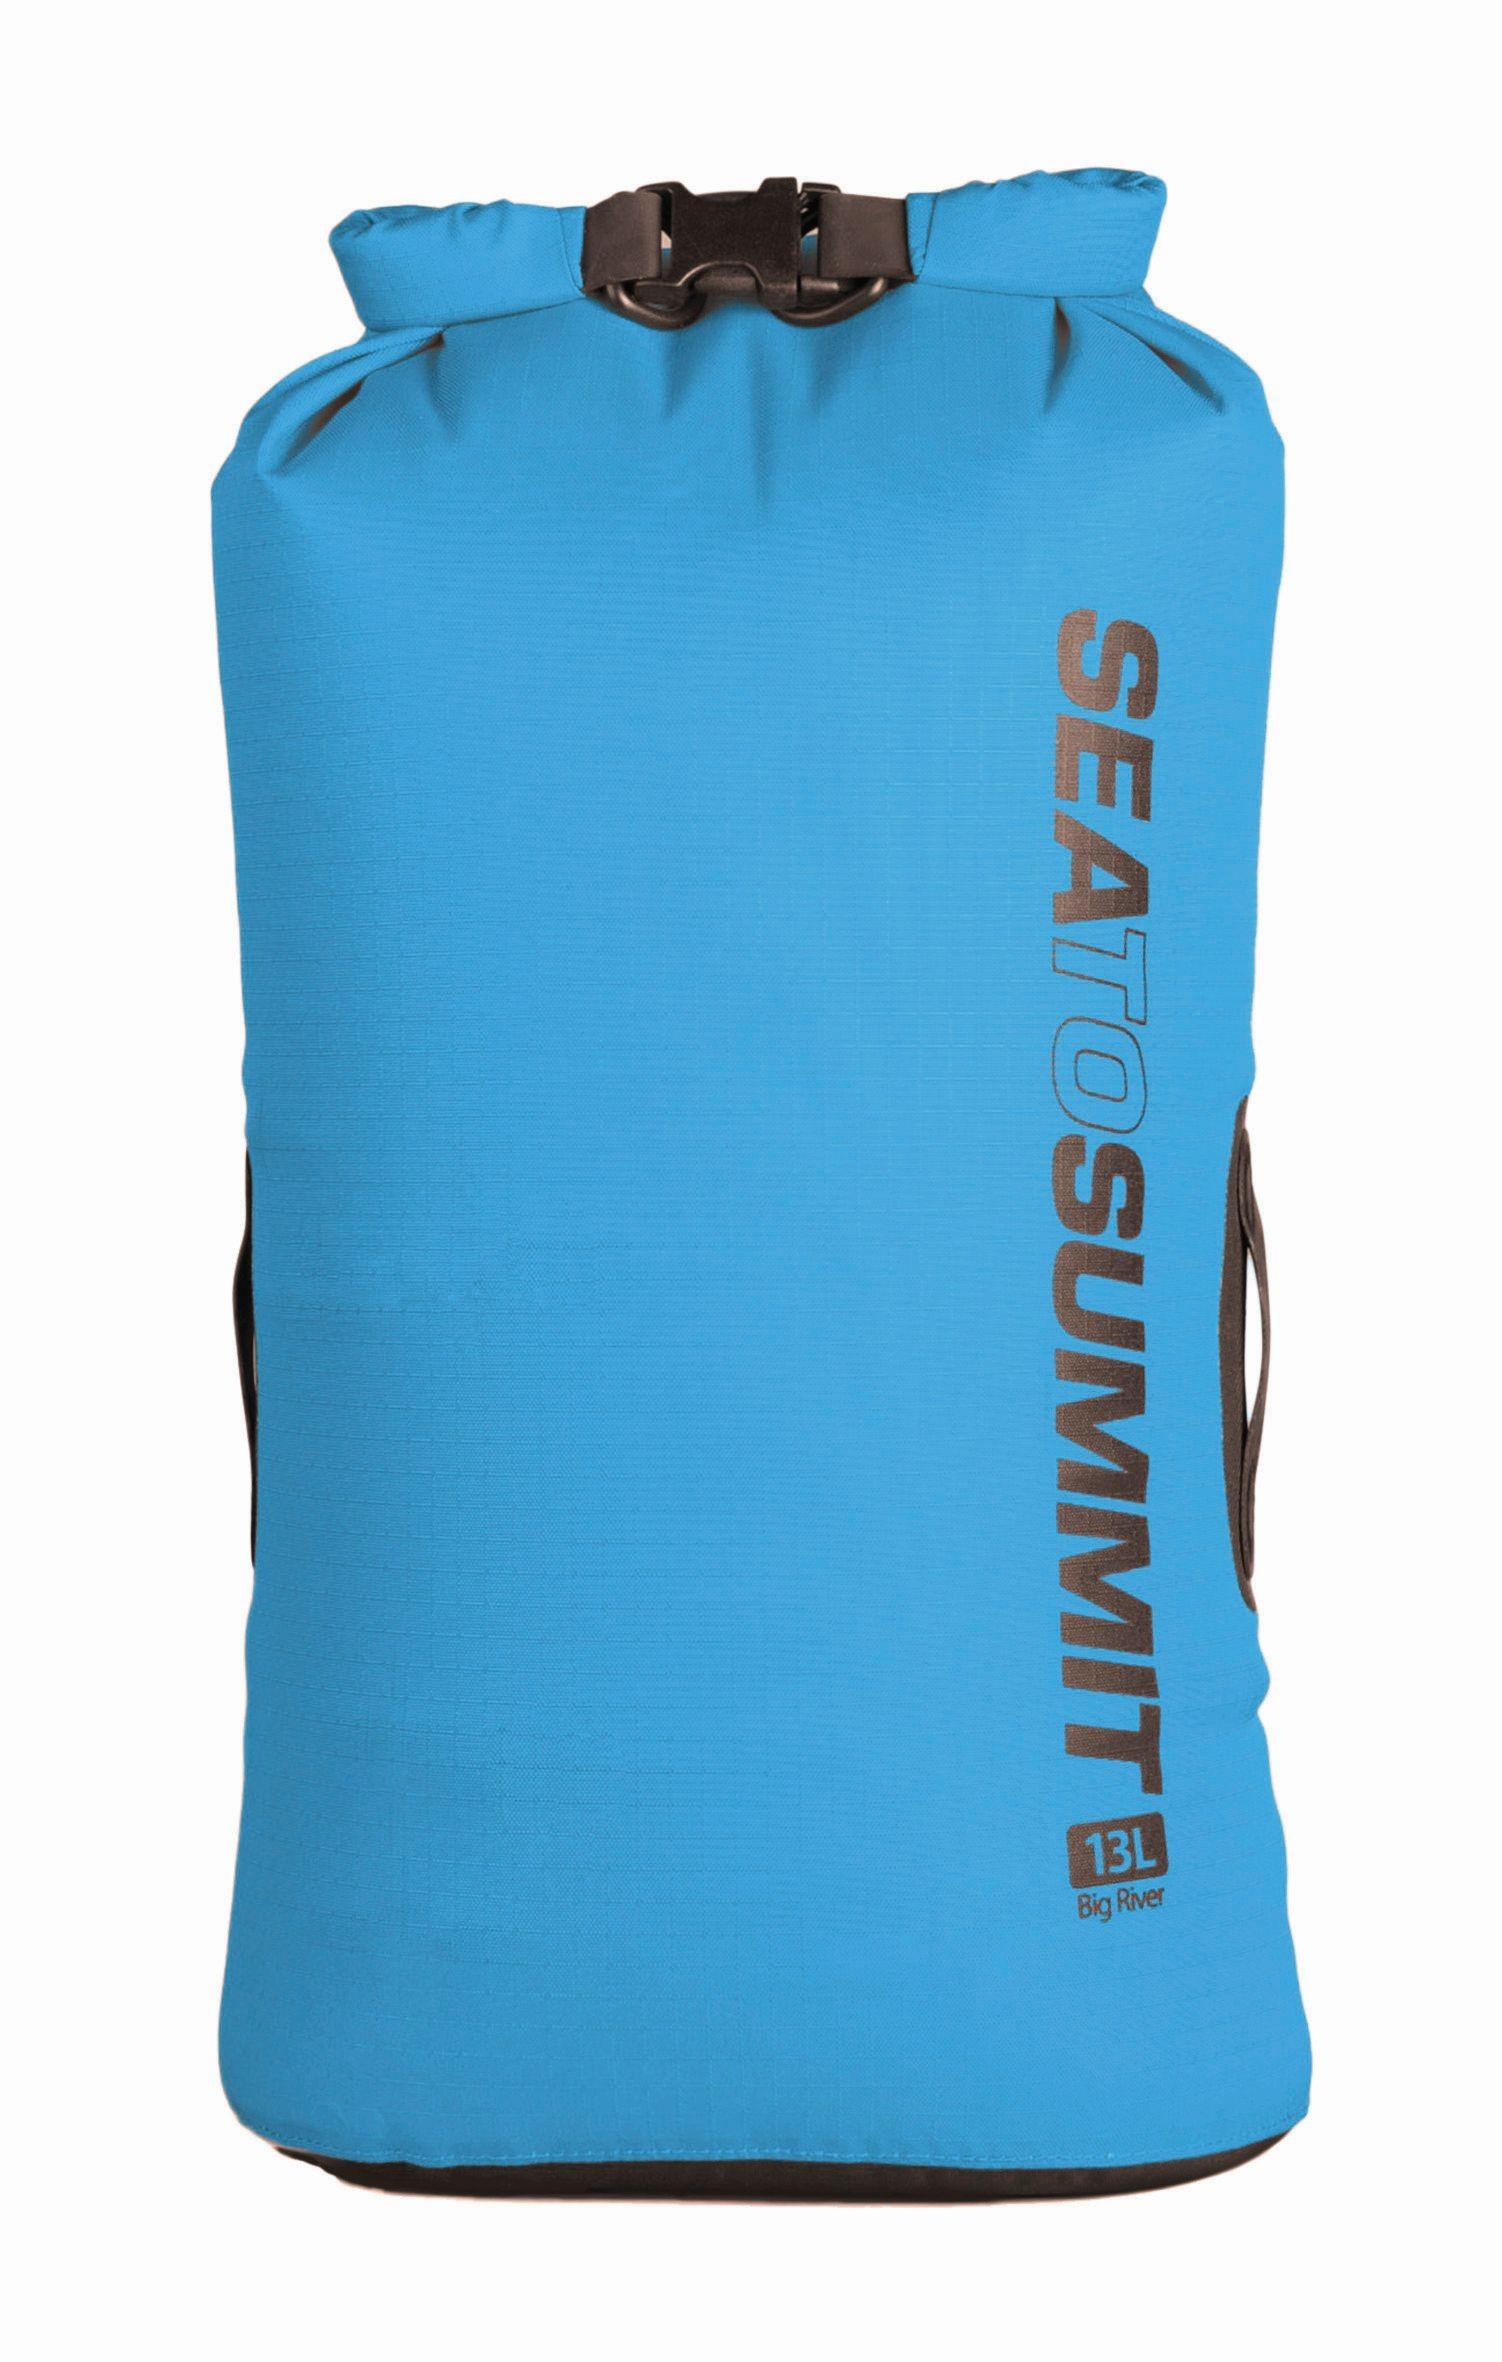 Sea To Summit Big River Dry Bag - 13 L